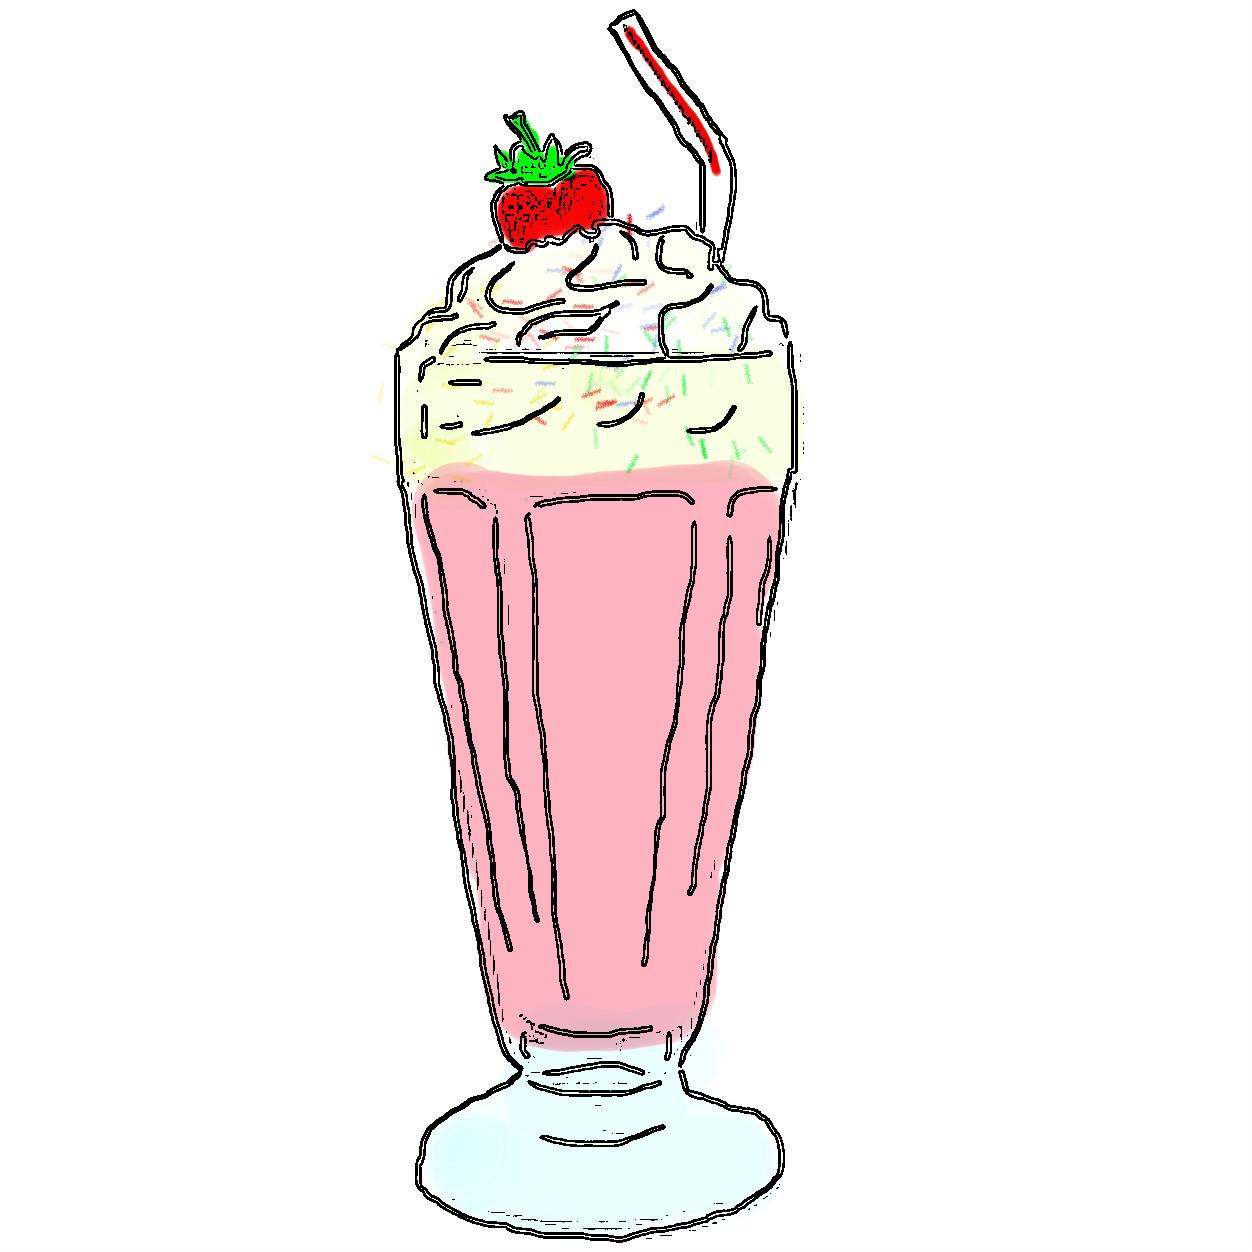 milkshake clipart rh supercliparts blogspot com milkshake clipart black and white banana milkshake clipart